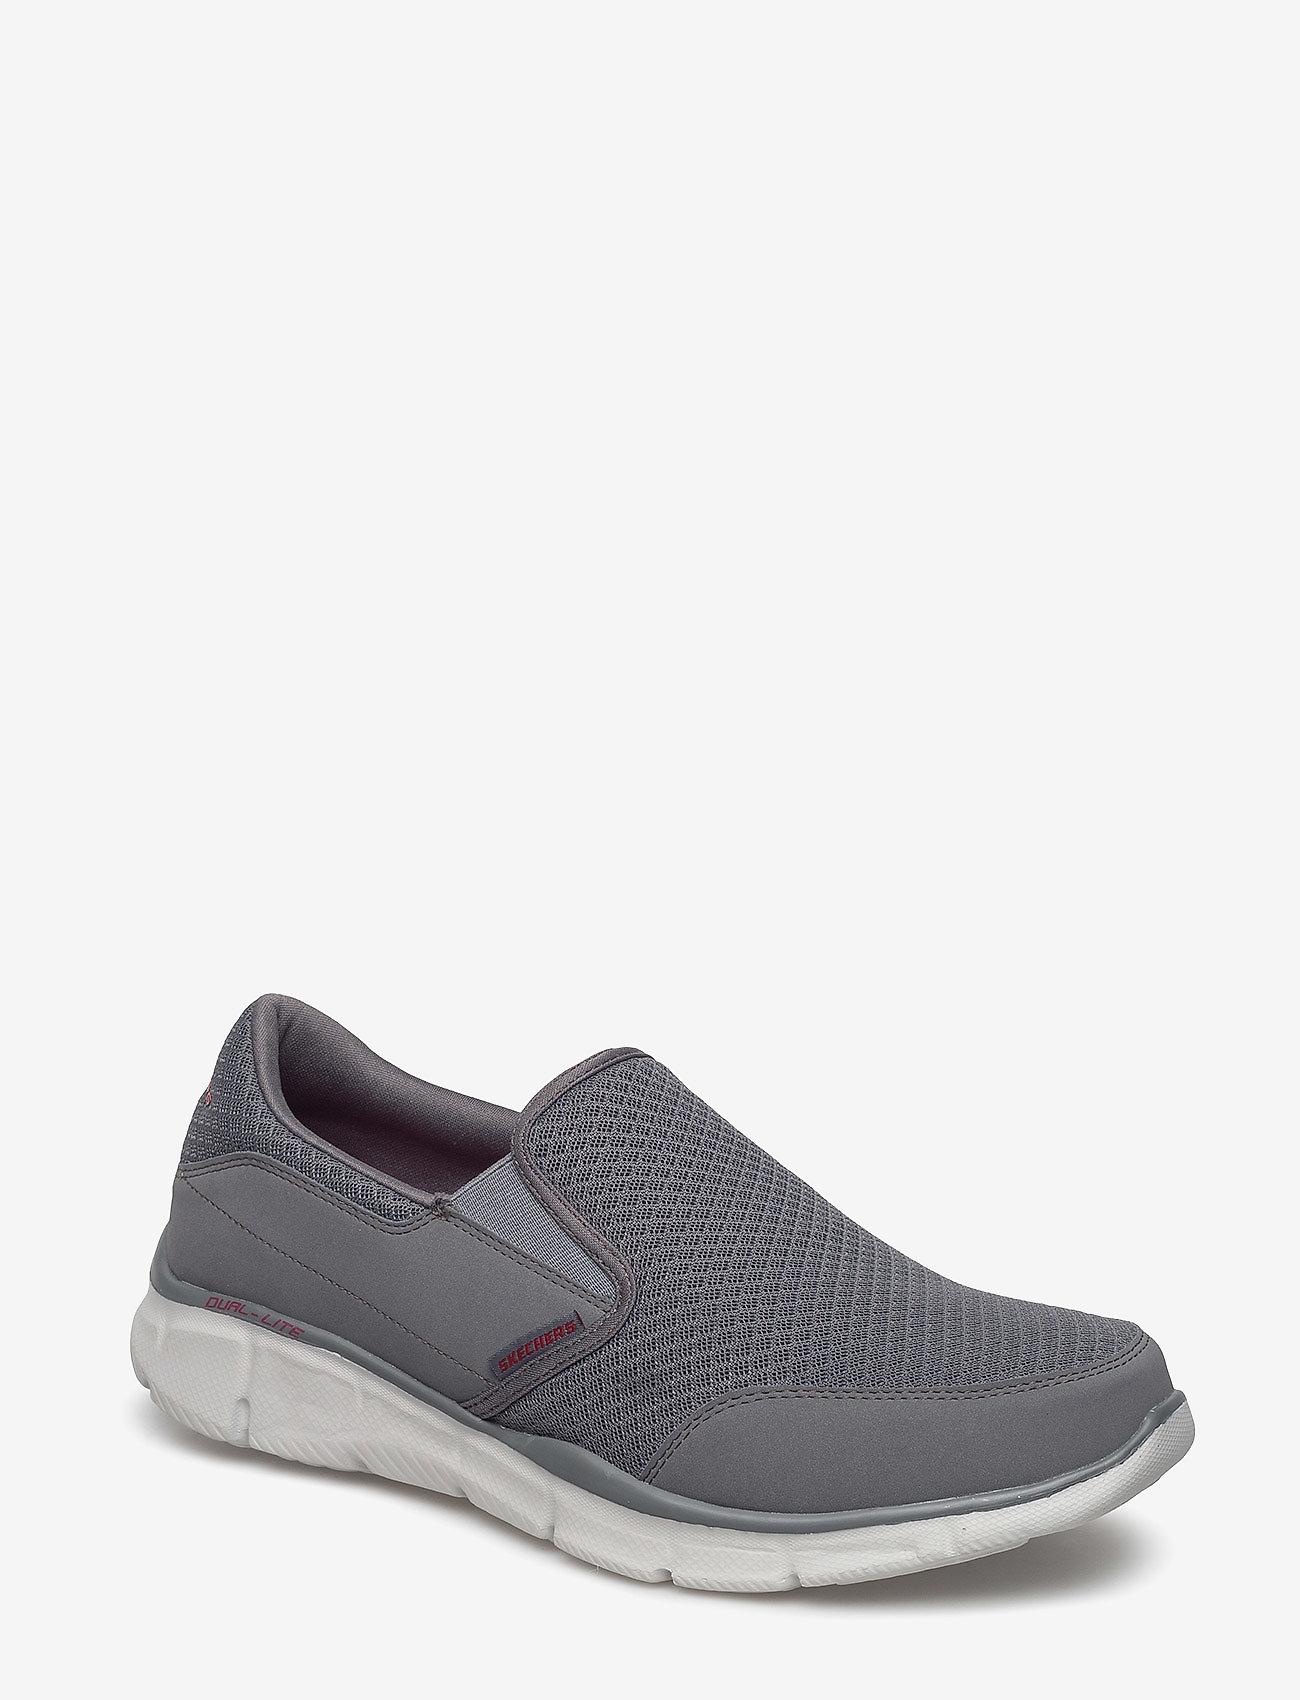 Skechers - Mens Equalizer Persistent - sportiska stila apavi bez aizdares - char charcoal - 0